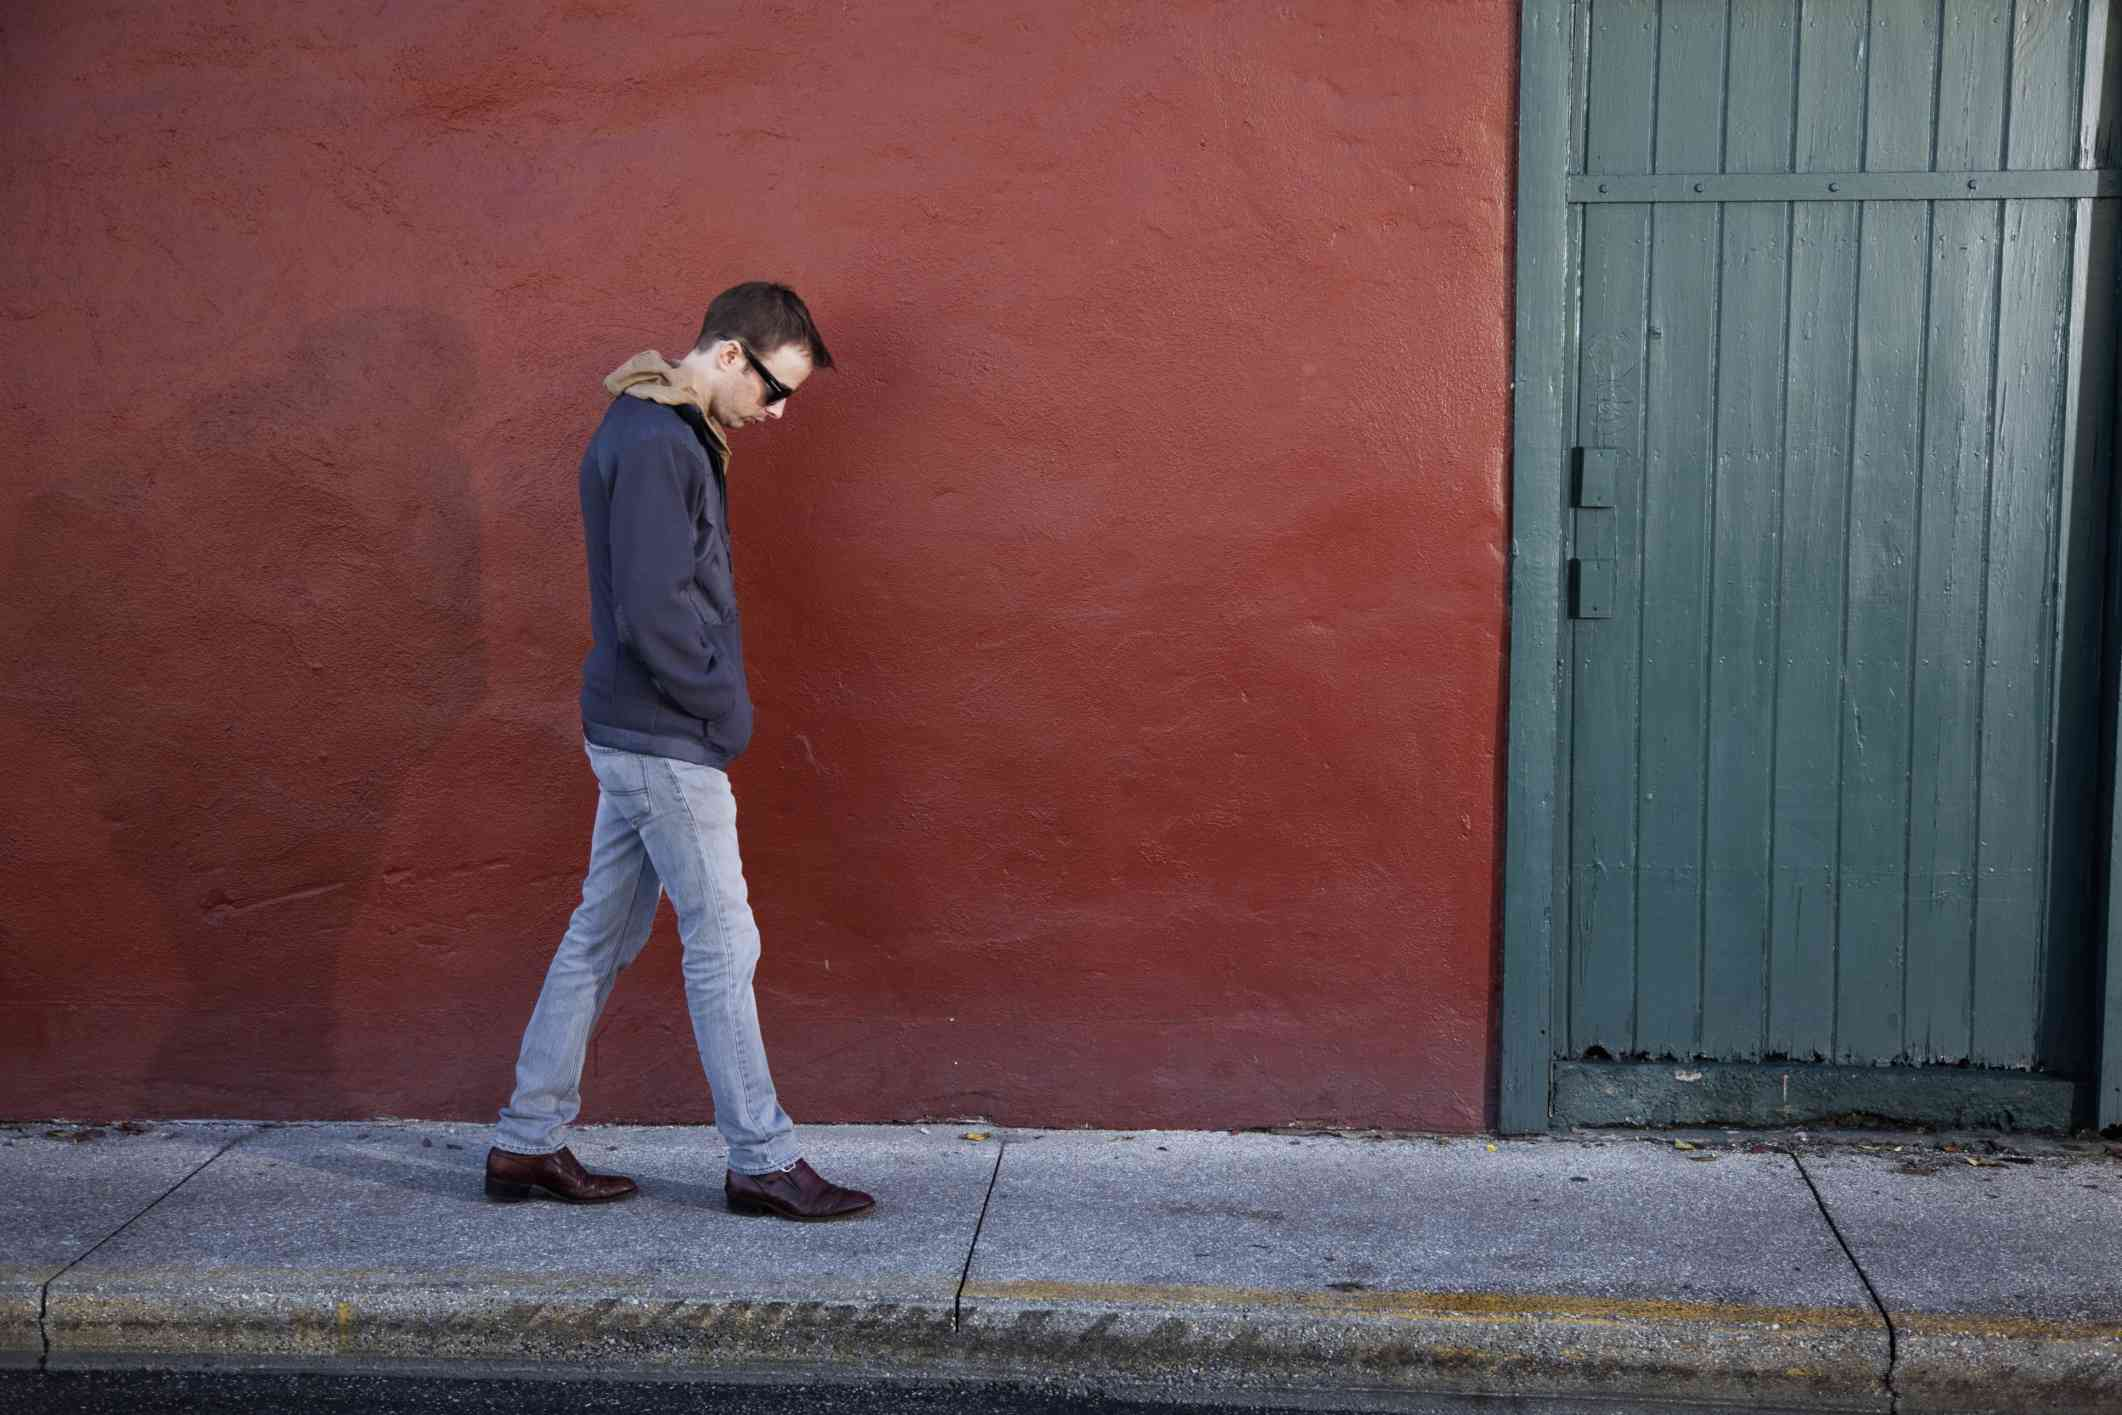 Man walking down a sidewalk image